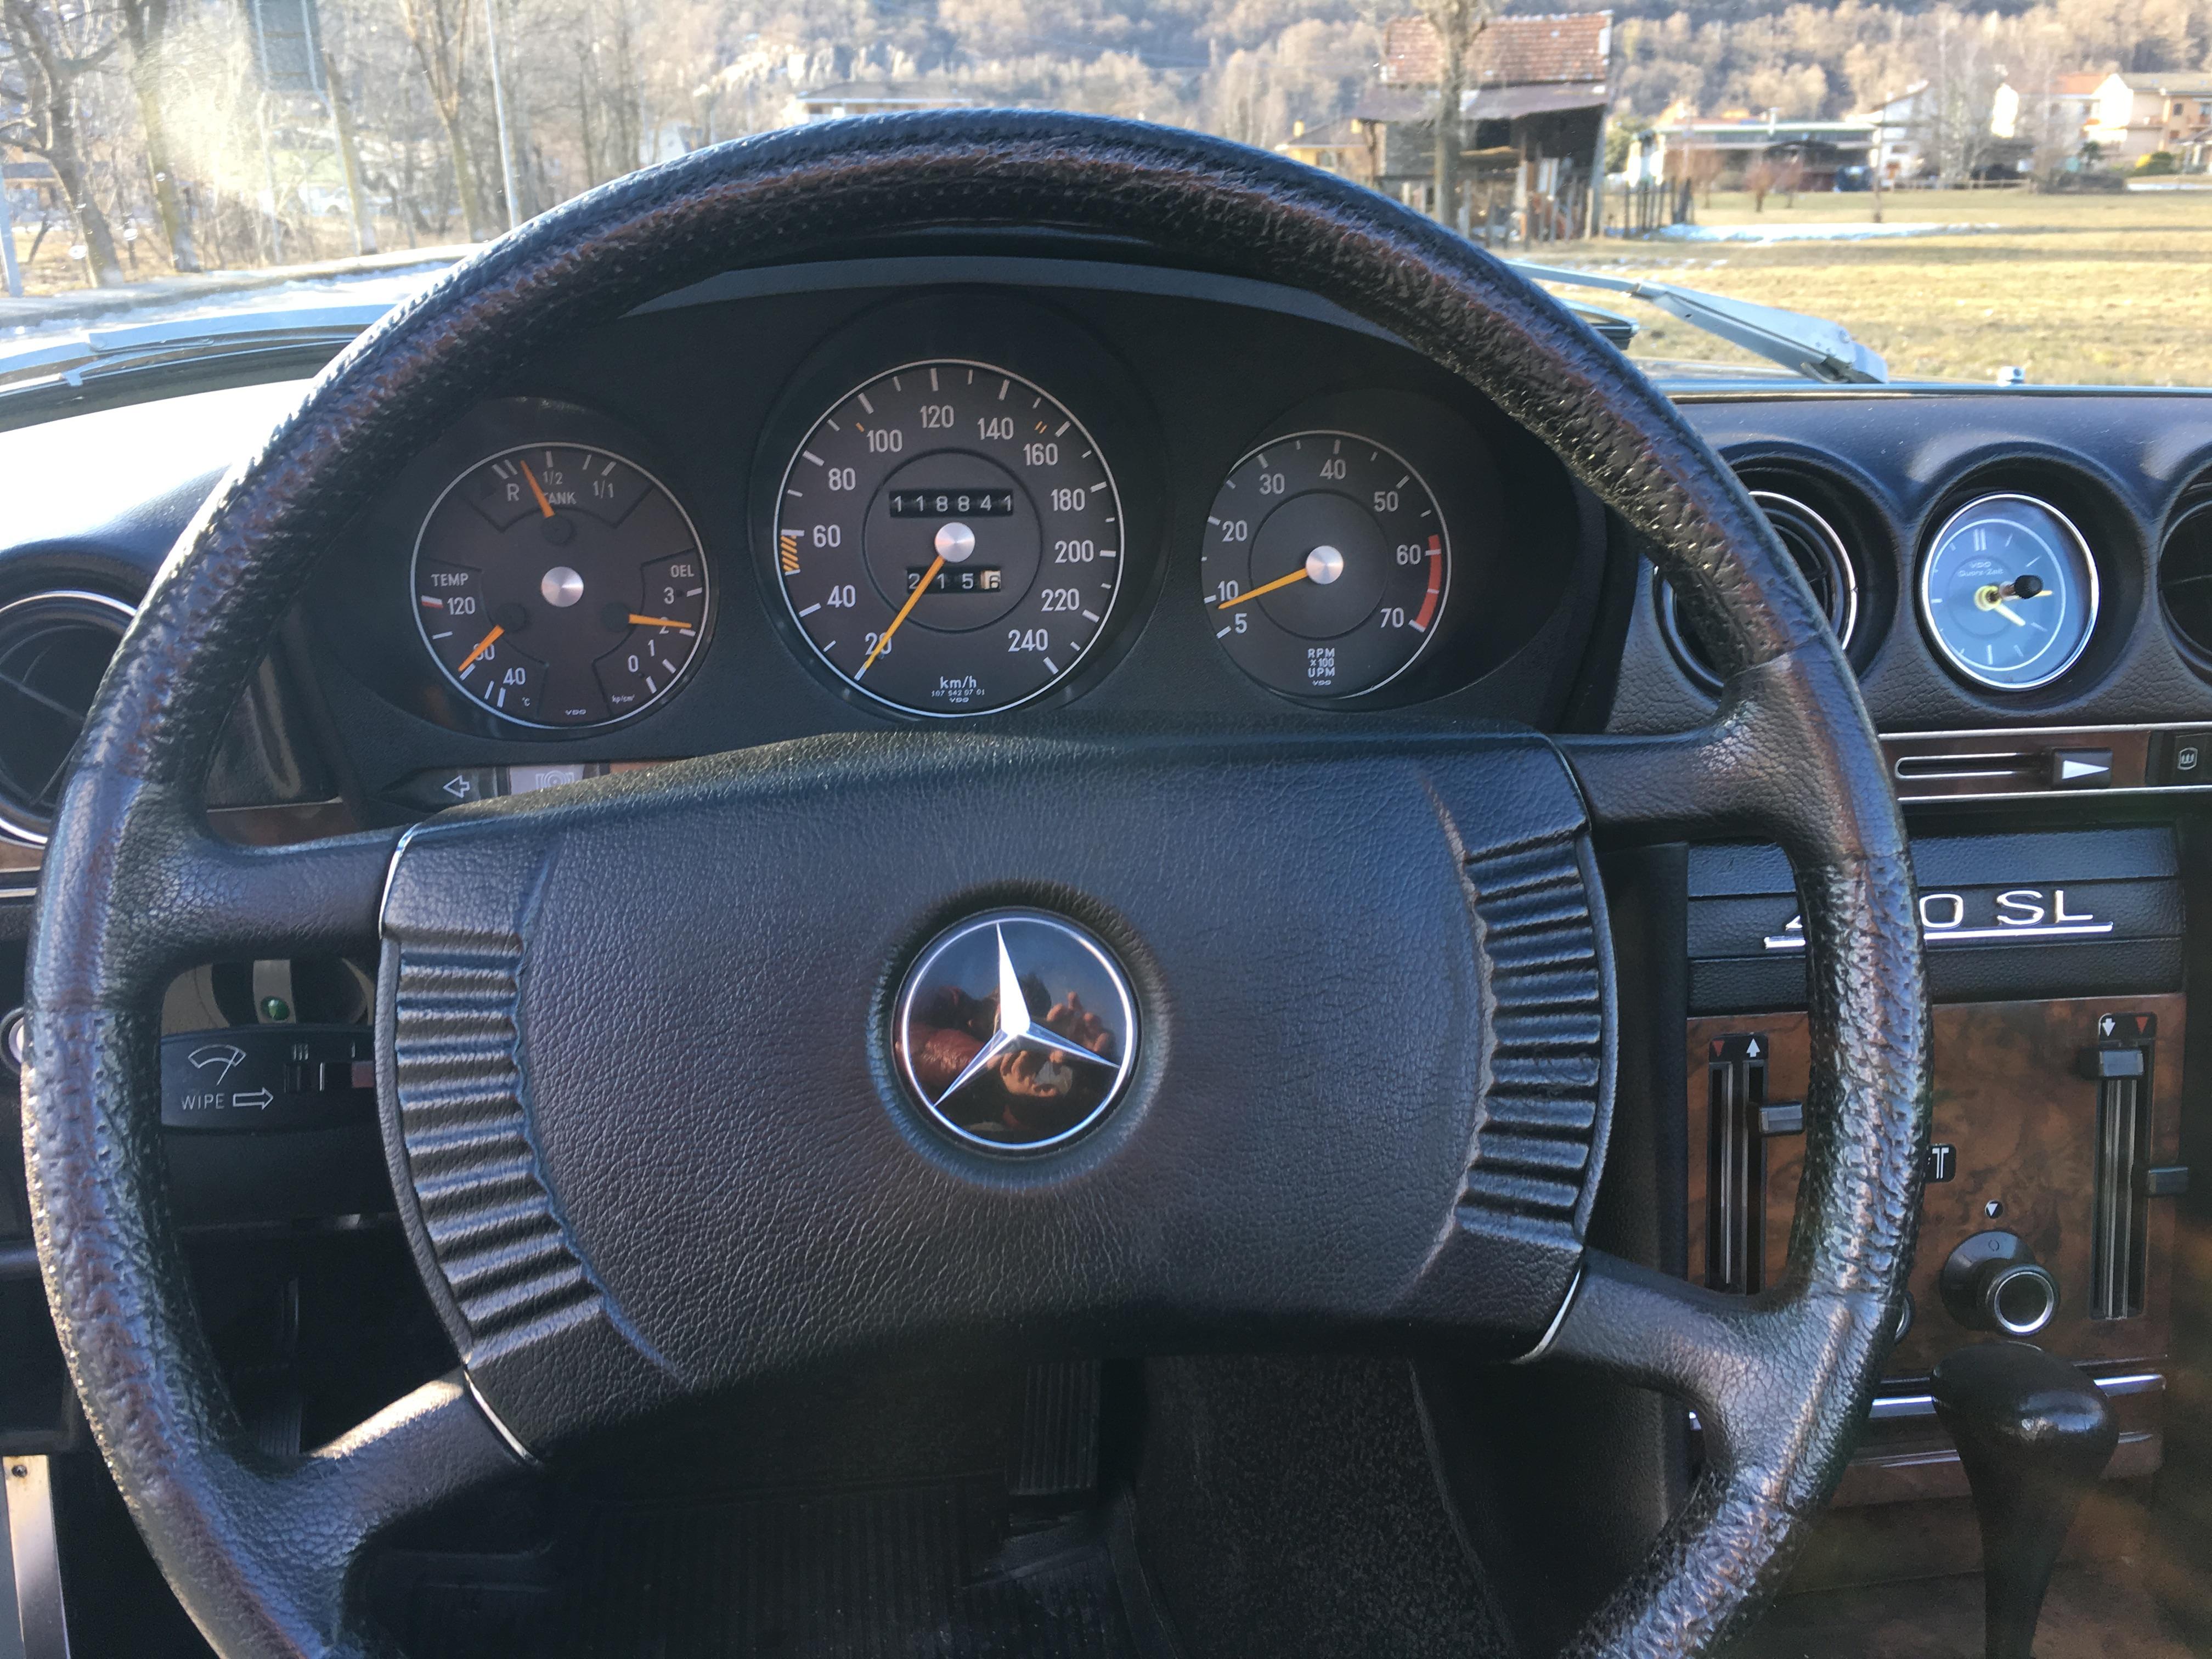 450 SL